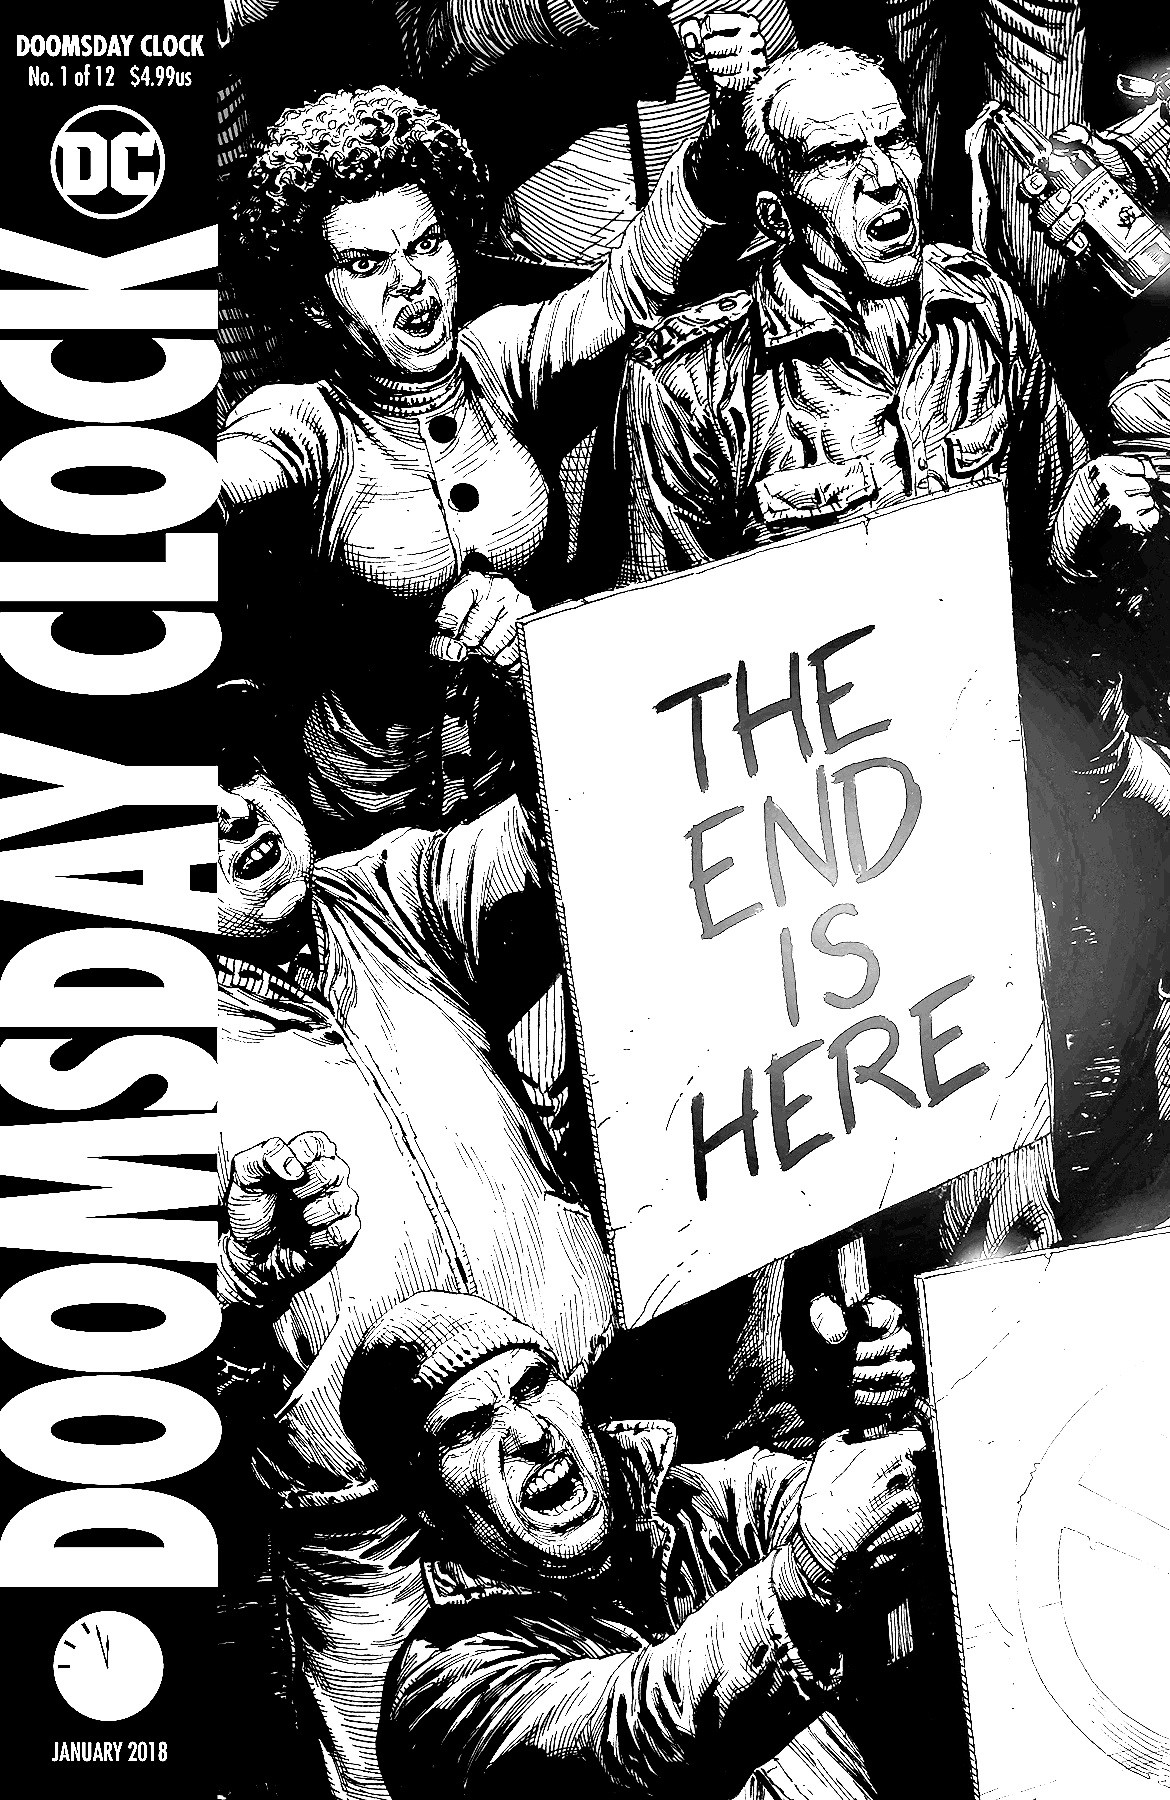 doomsday1.jpg